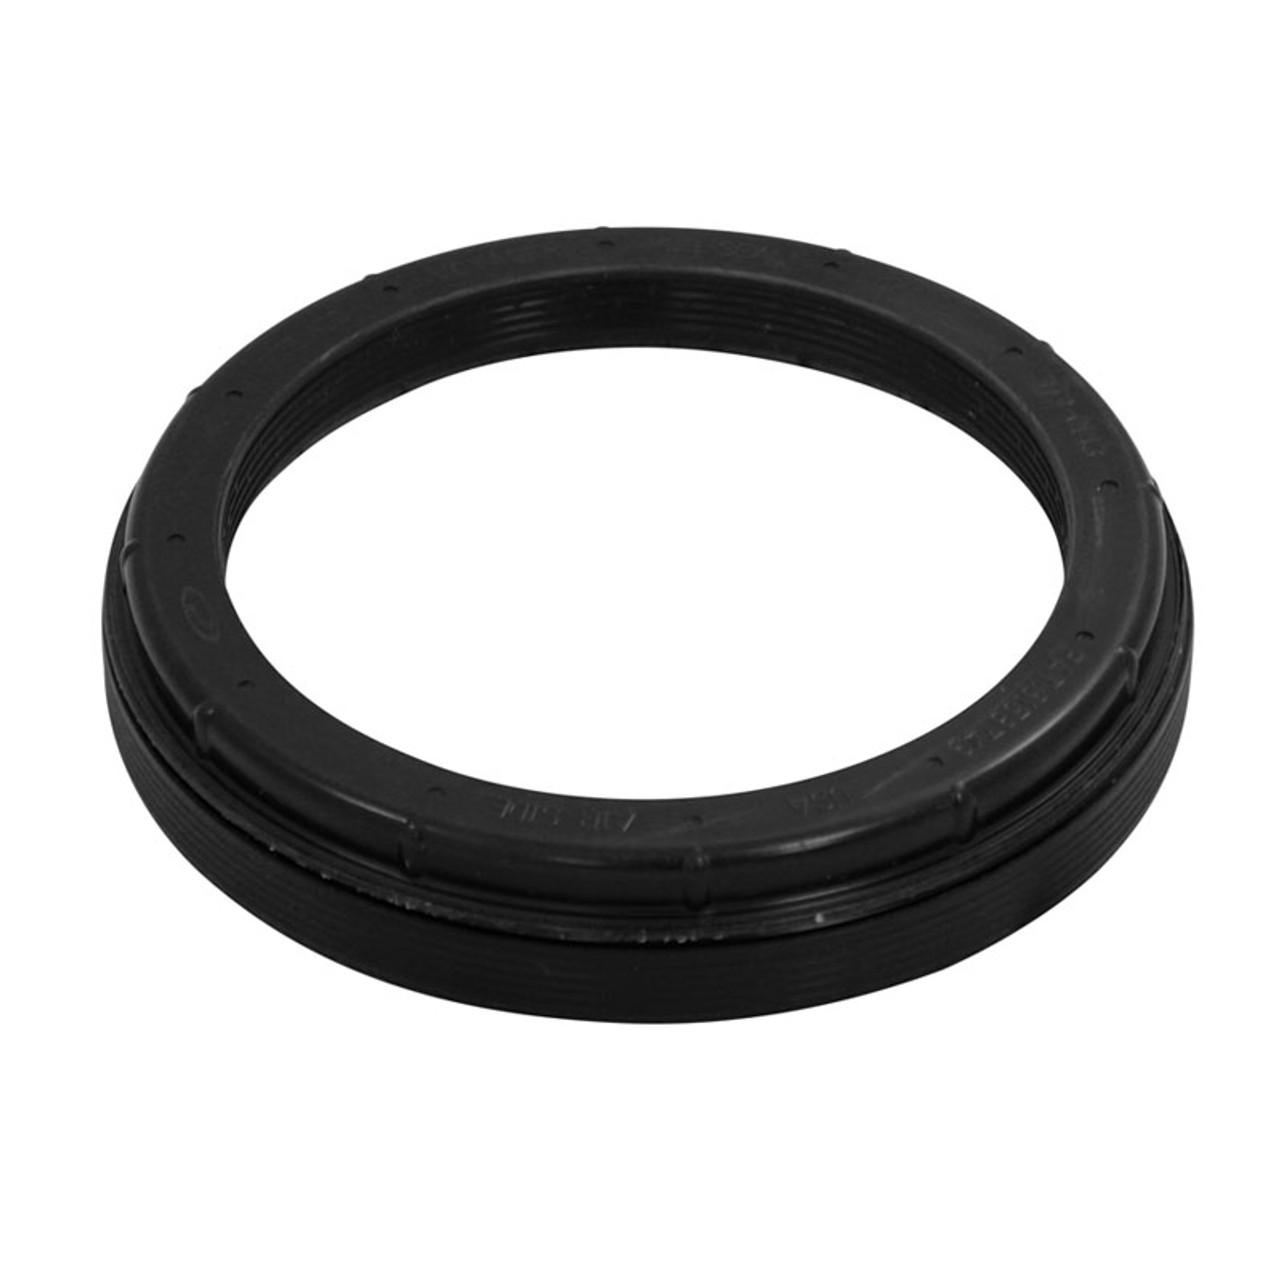 Stemco Voyager Oil Seal - # 3730123